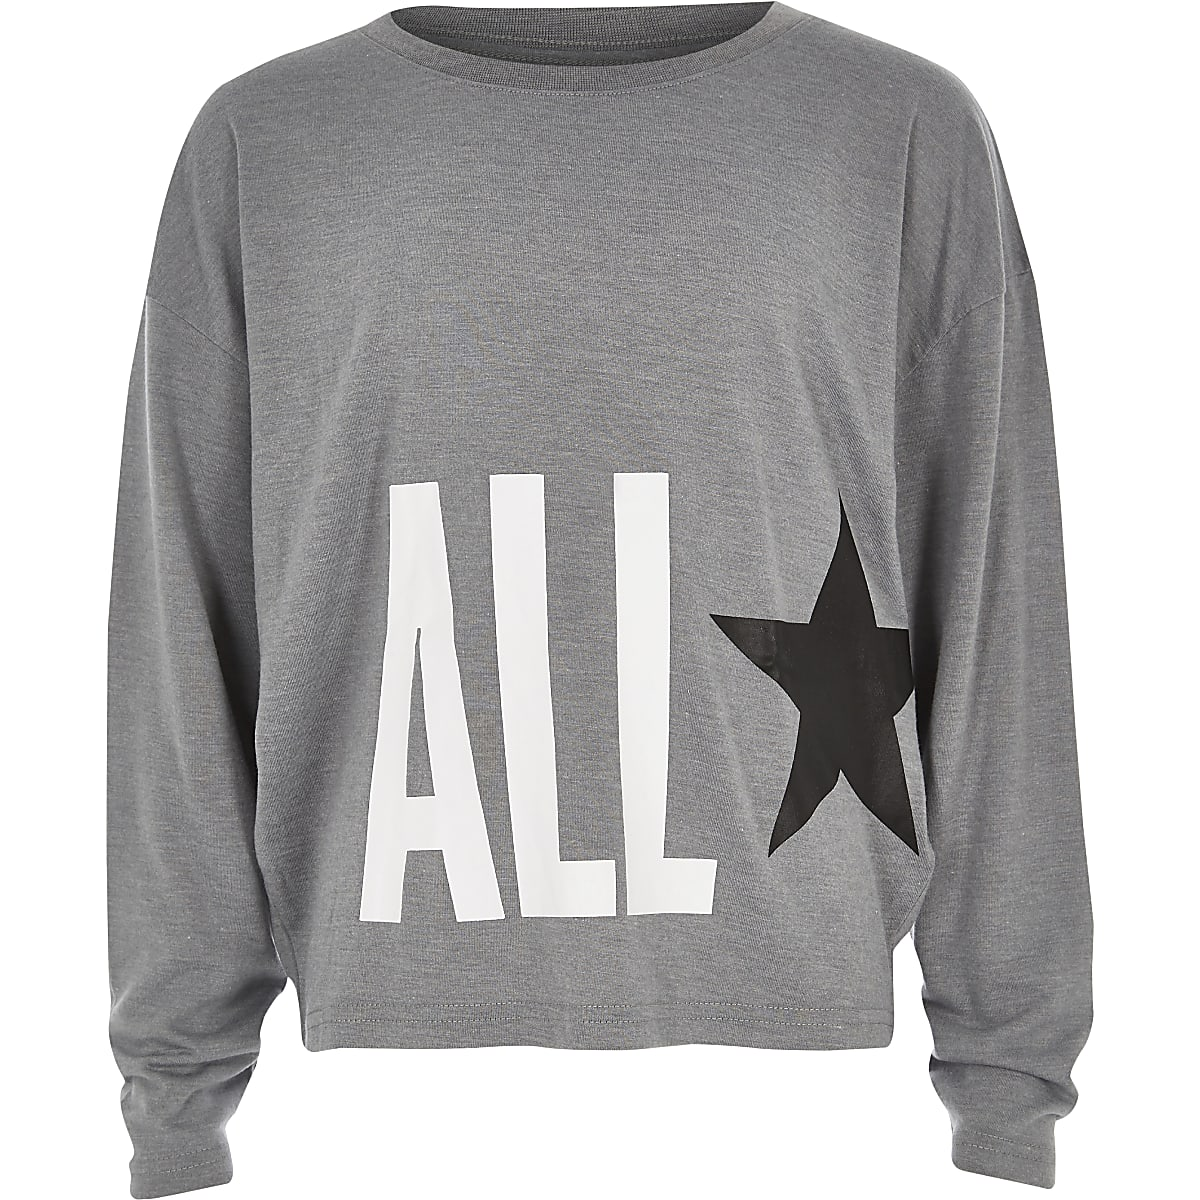 Girls Converse light grey oversized star top